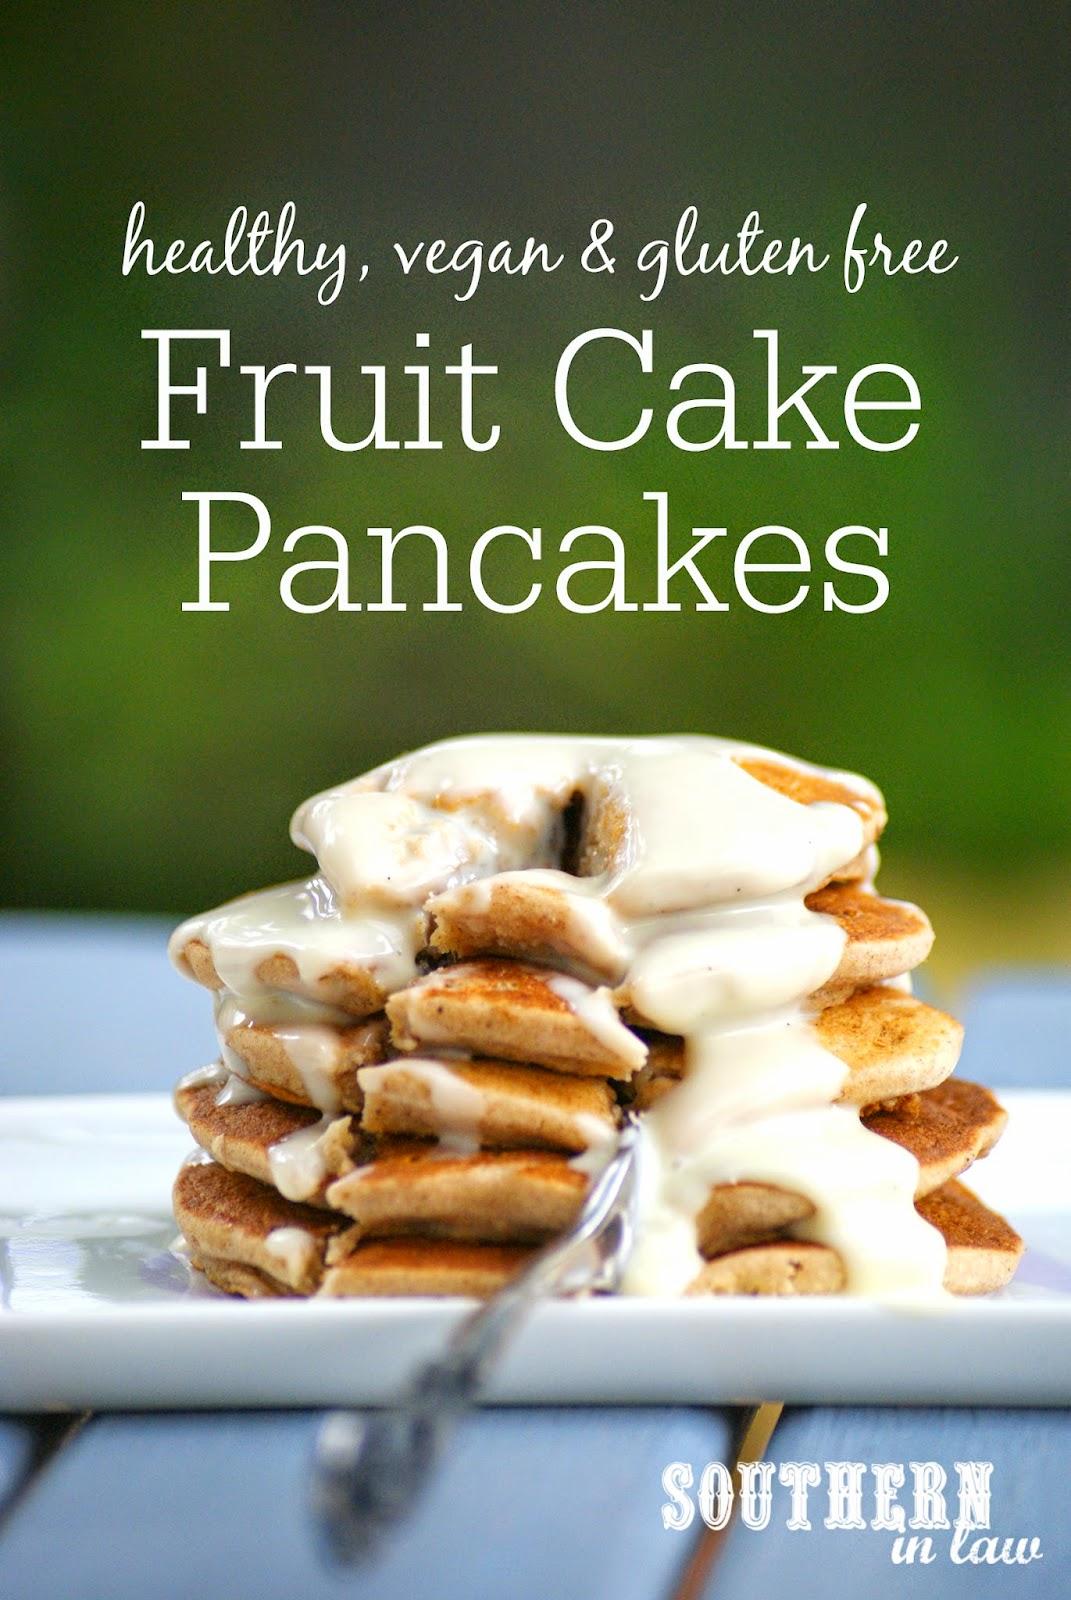 Gluten Free Fruit Cakes Pancakes Recipe for Christmas - low fat, gluten free, vegan, healthy, sugar free, dairy free, egg free